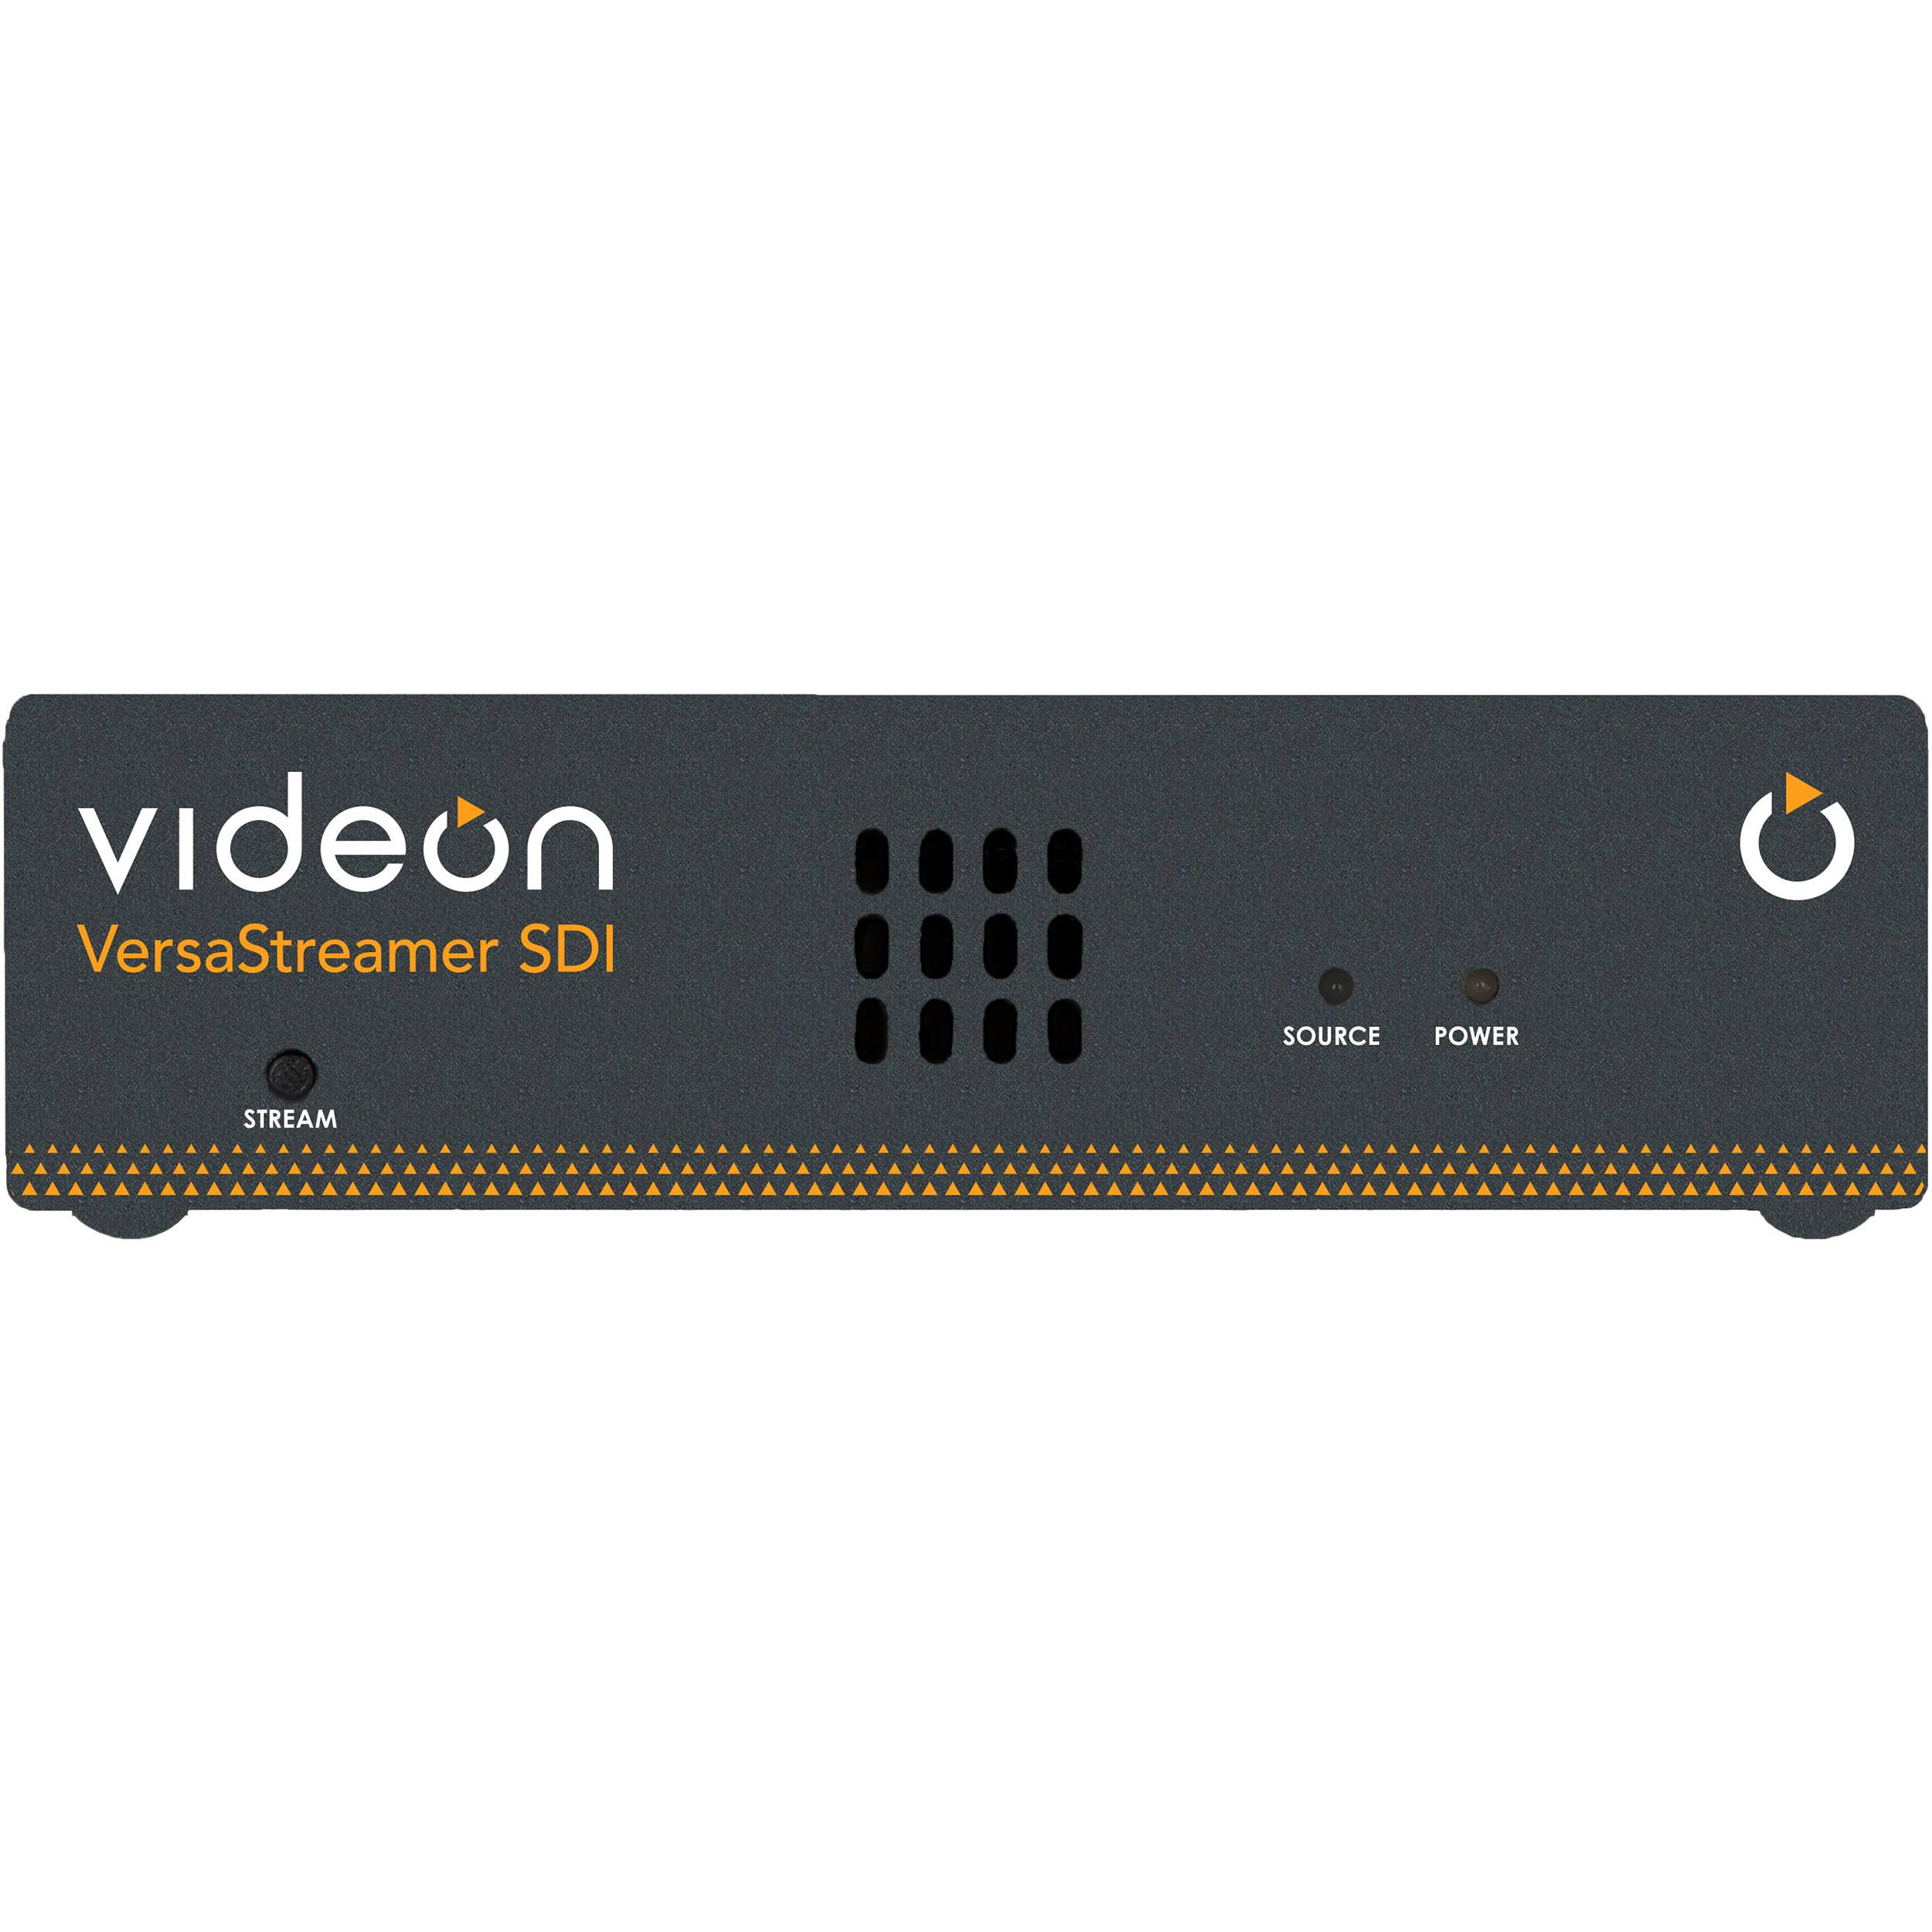 Videon VersaStreamer SDI Streaming Encoder/Decoder (HDMI/SDI)